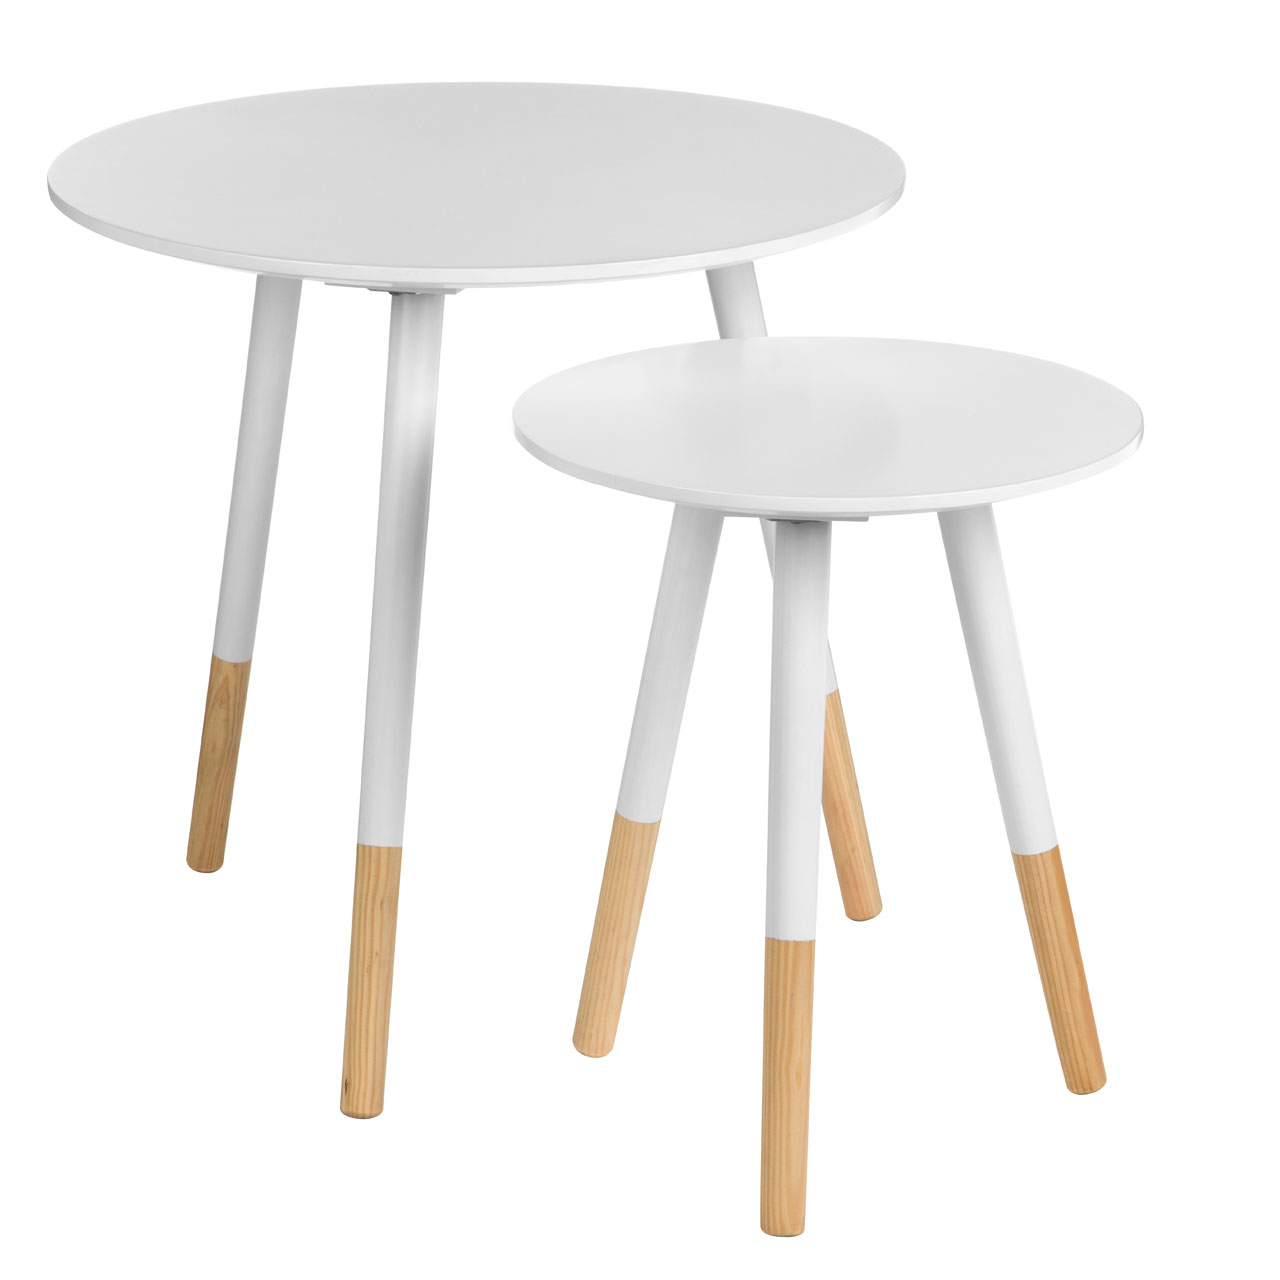 white side tables. viborg 2 side tables white wooden